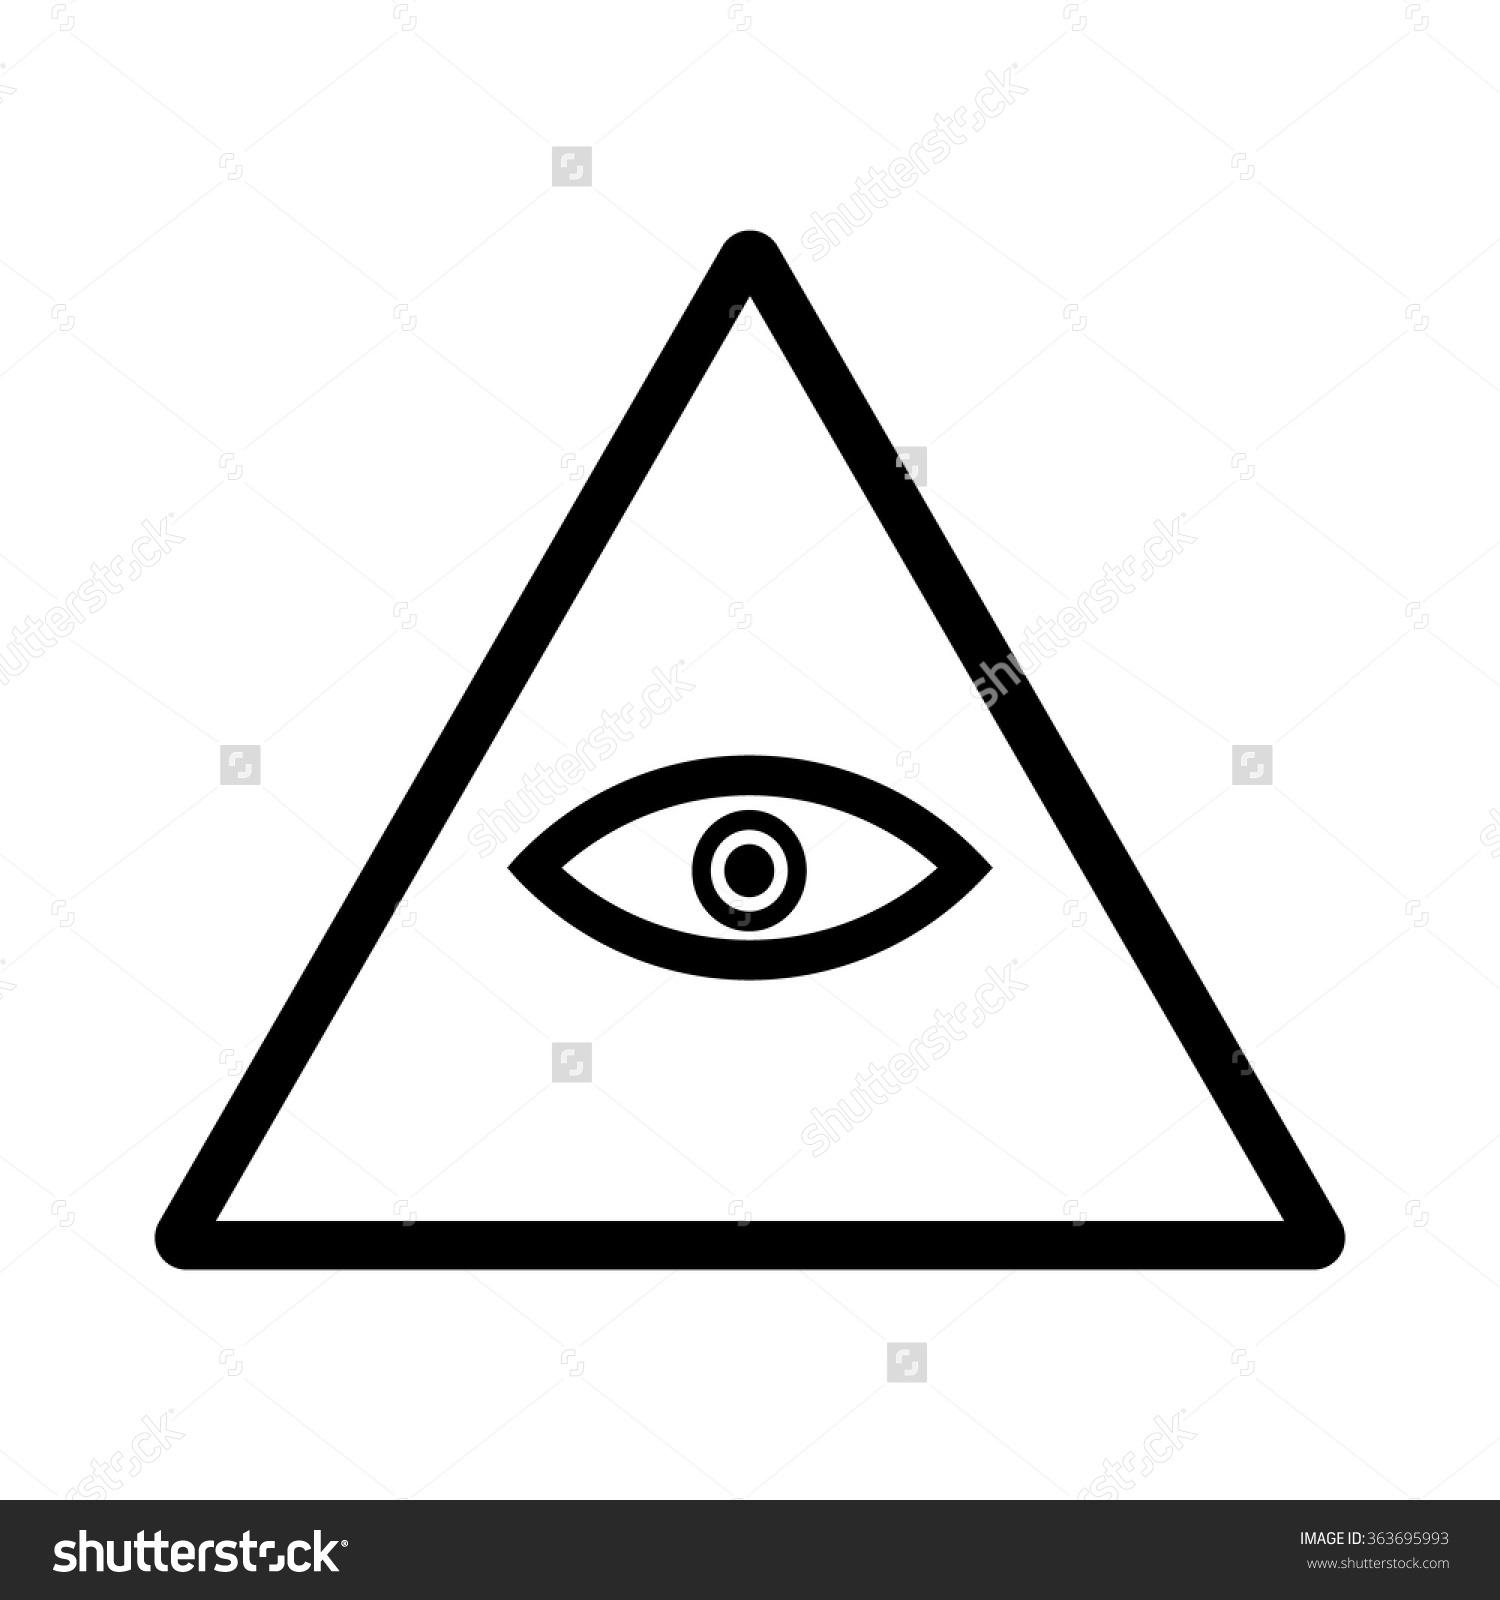 Illuminati clipart #4, Download drawings